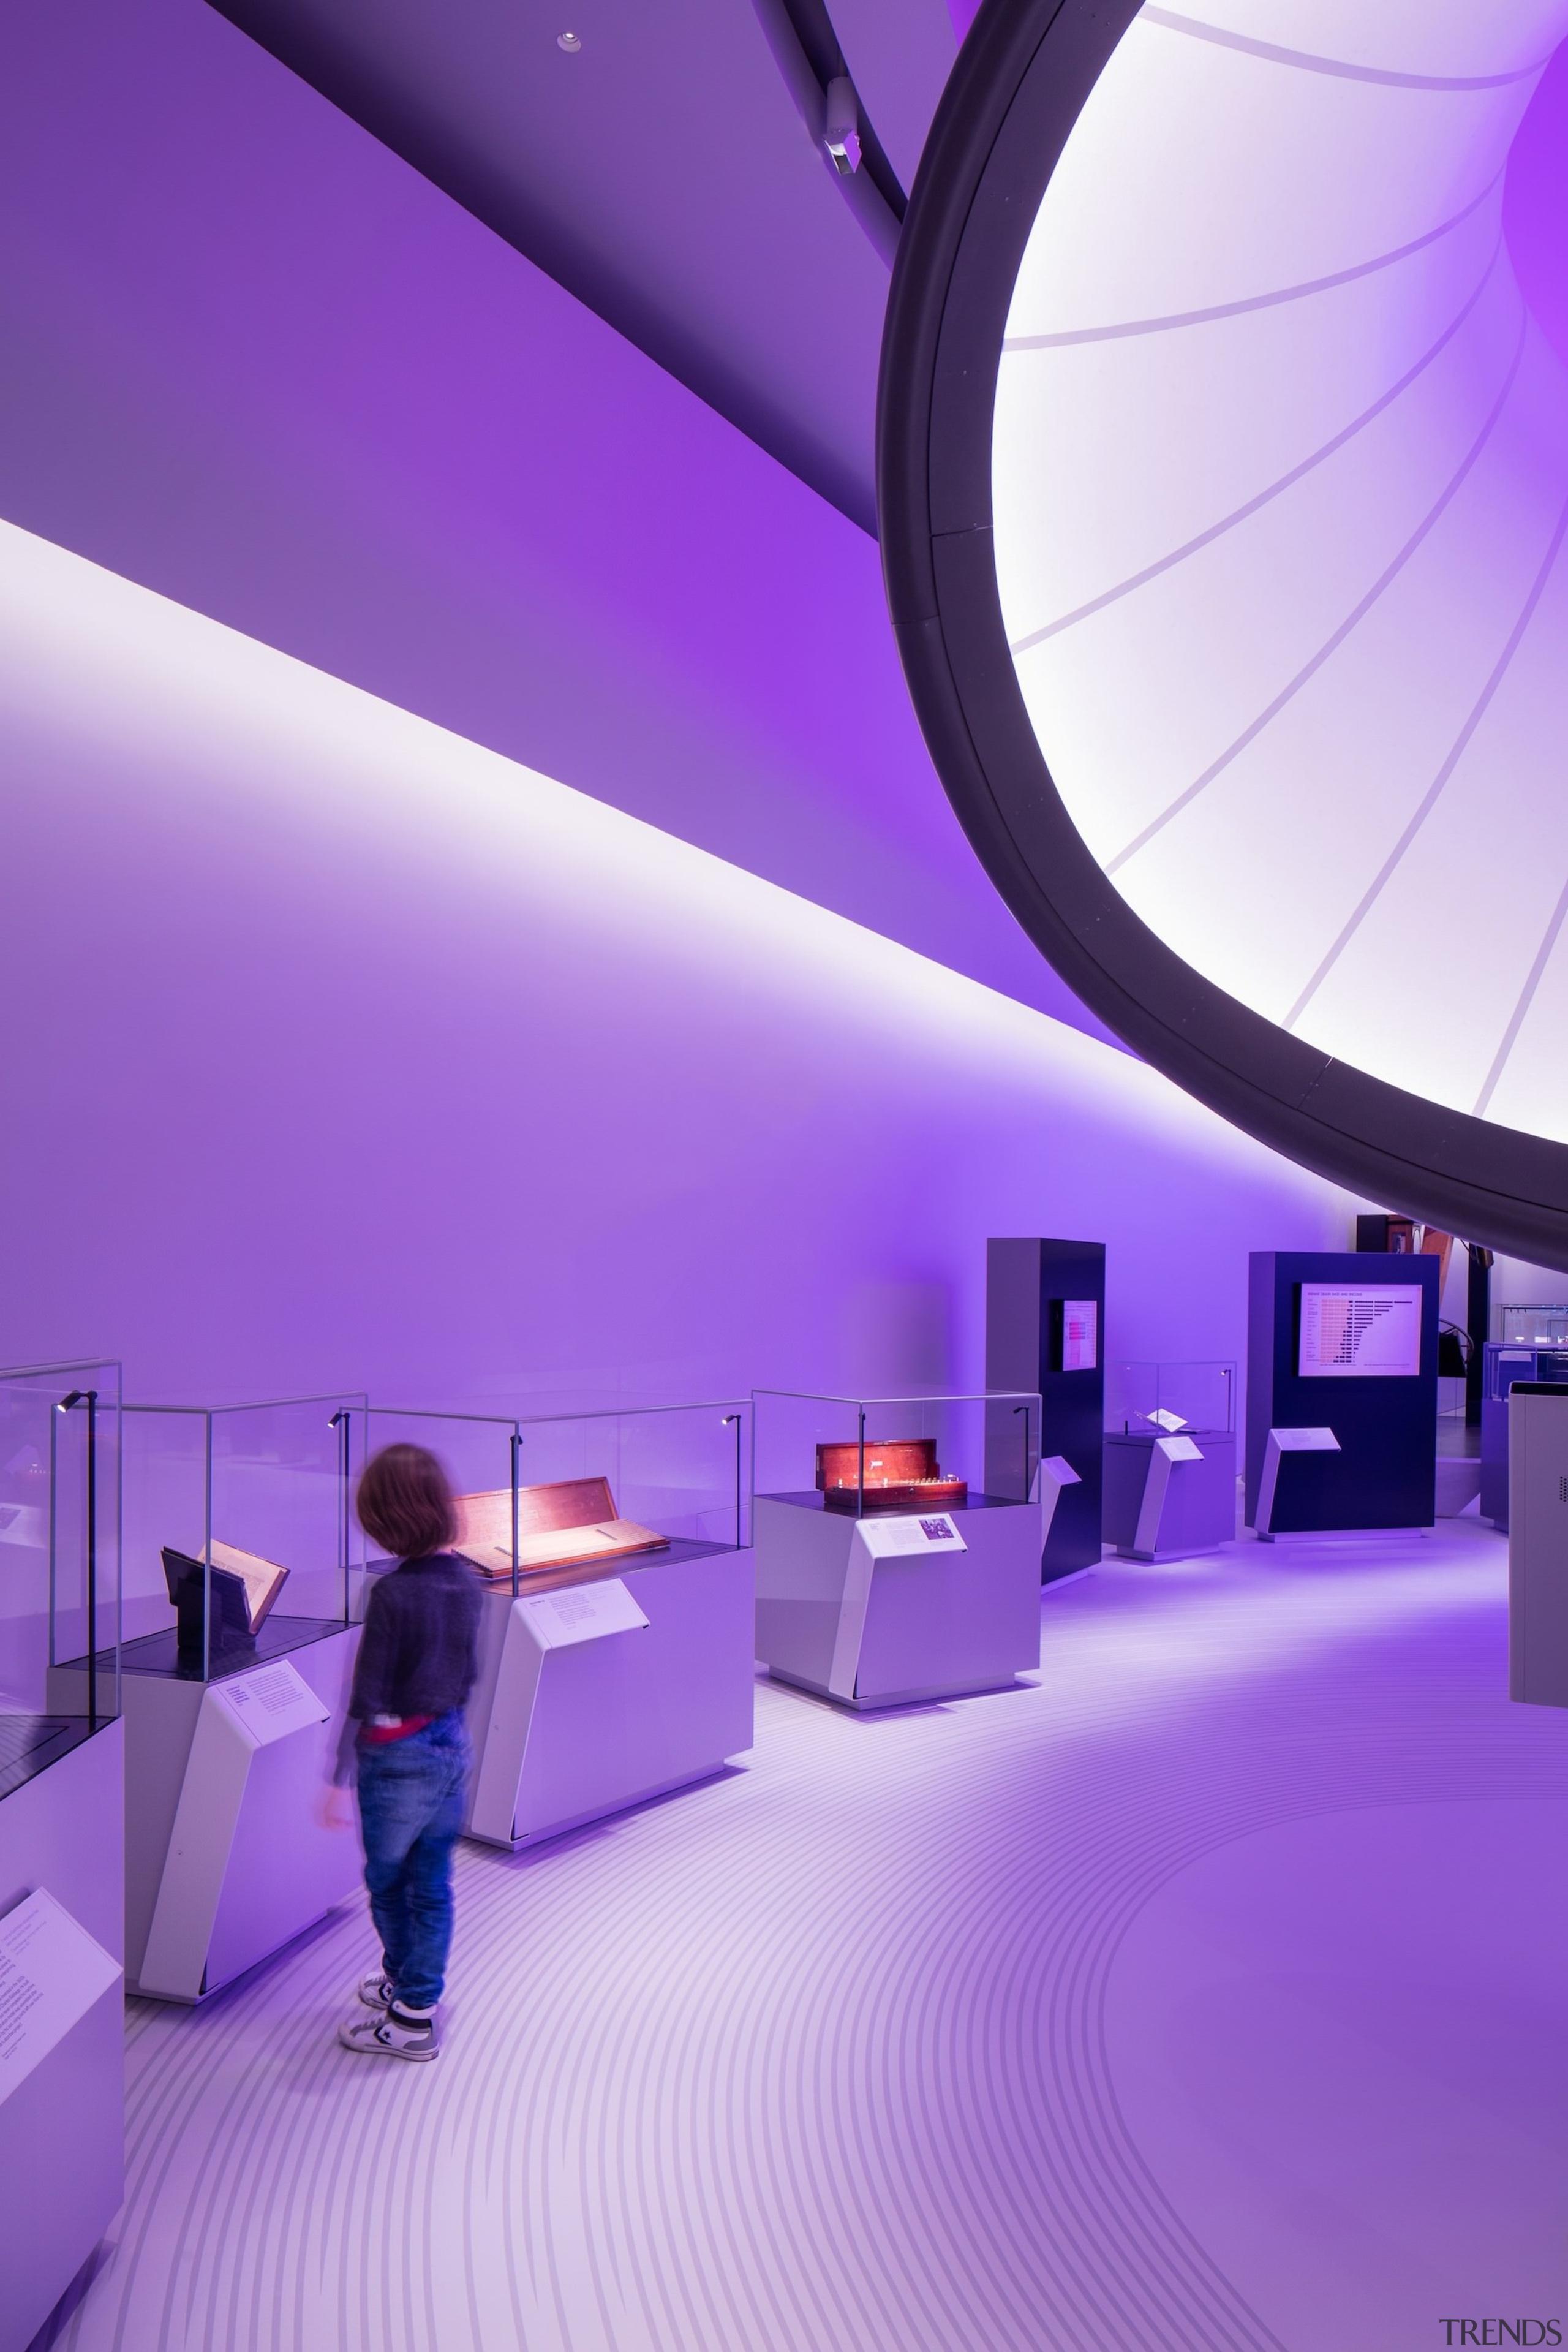 Zaha Hadid – Mathematics: The Winton Gallery – architecture, ceiling, design, interior design, light, lighting, product design, purple, purple